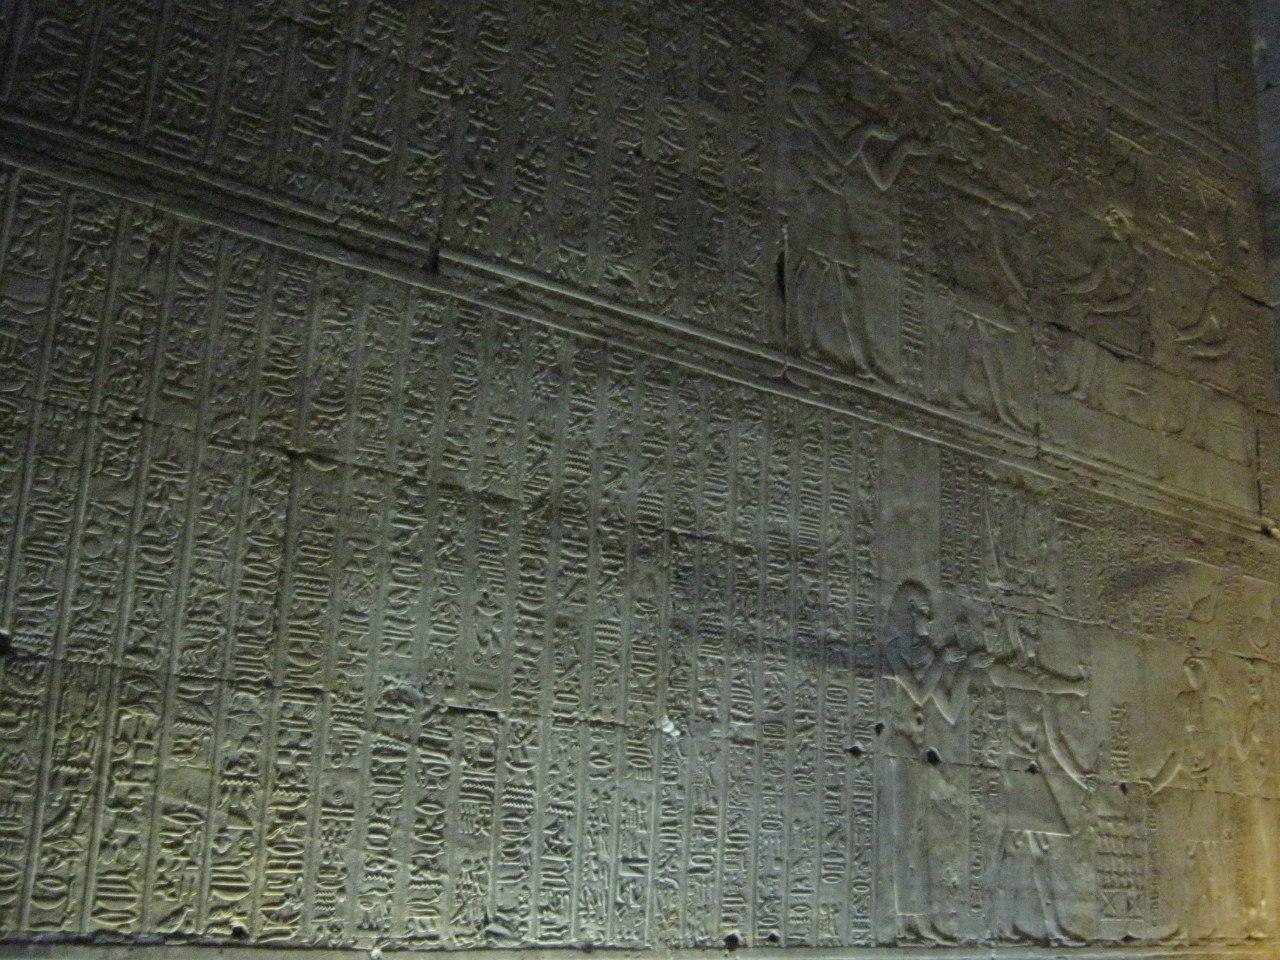 Древние рисунки и письмена в храме Хорус